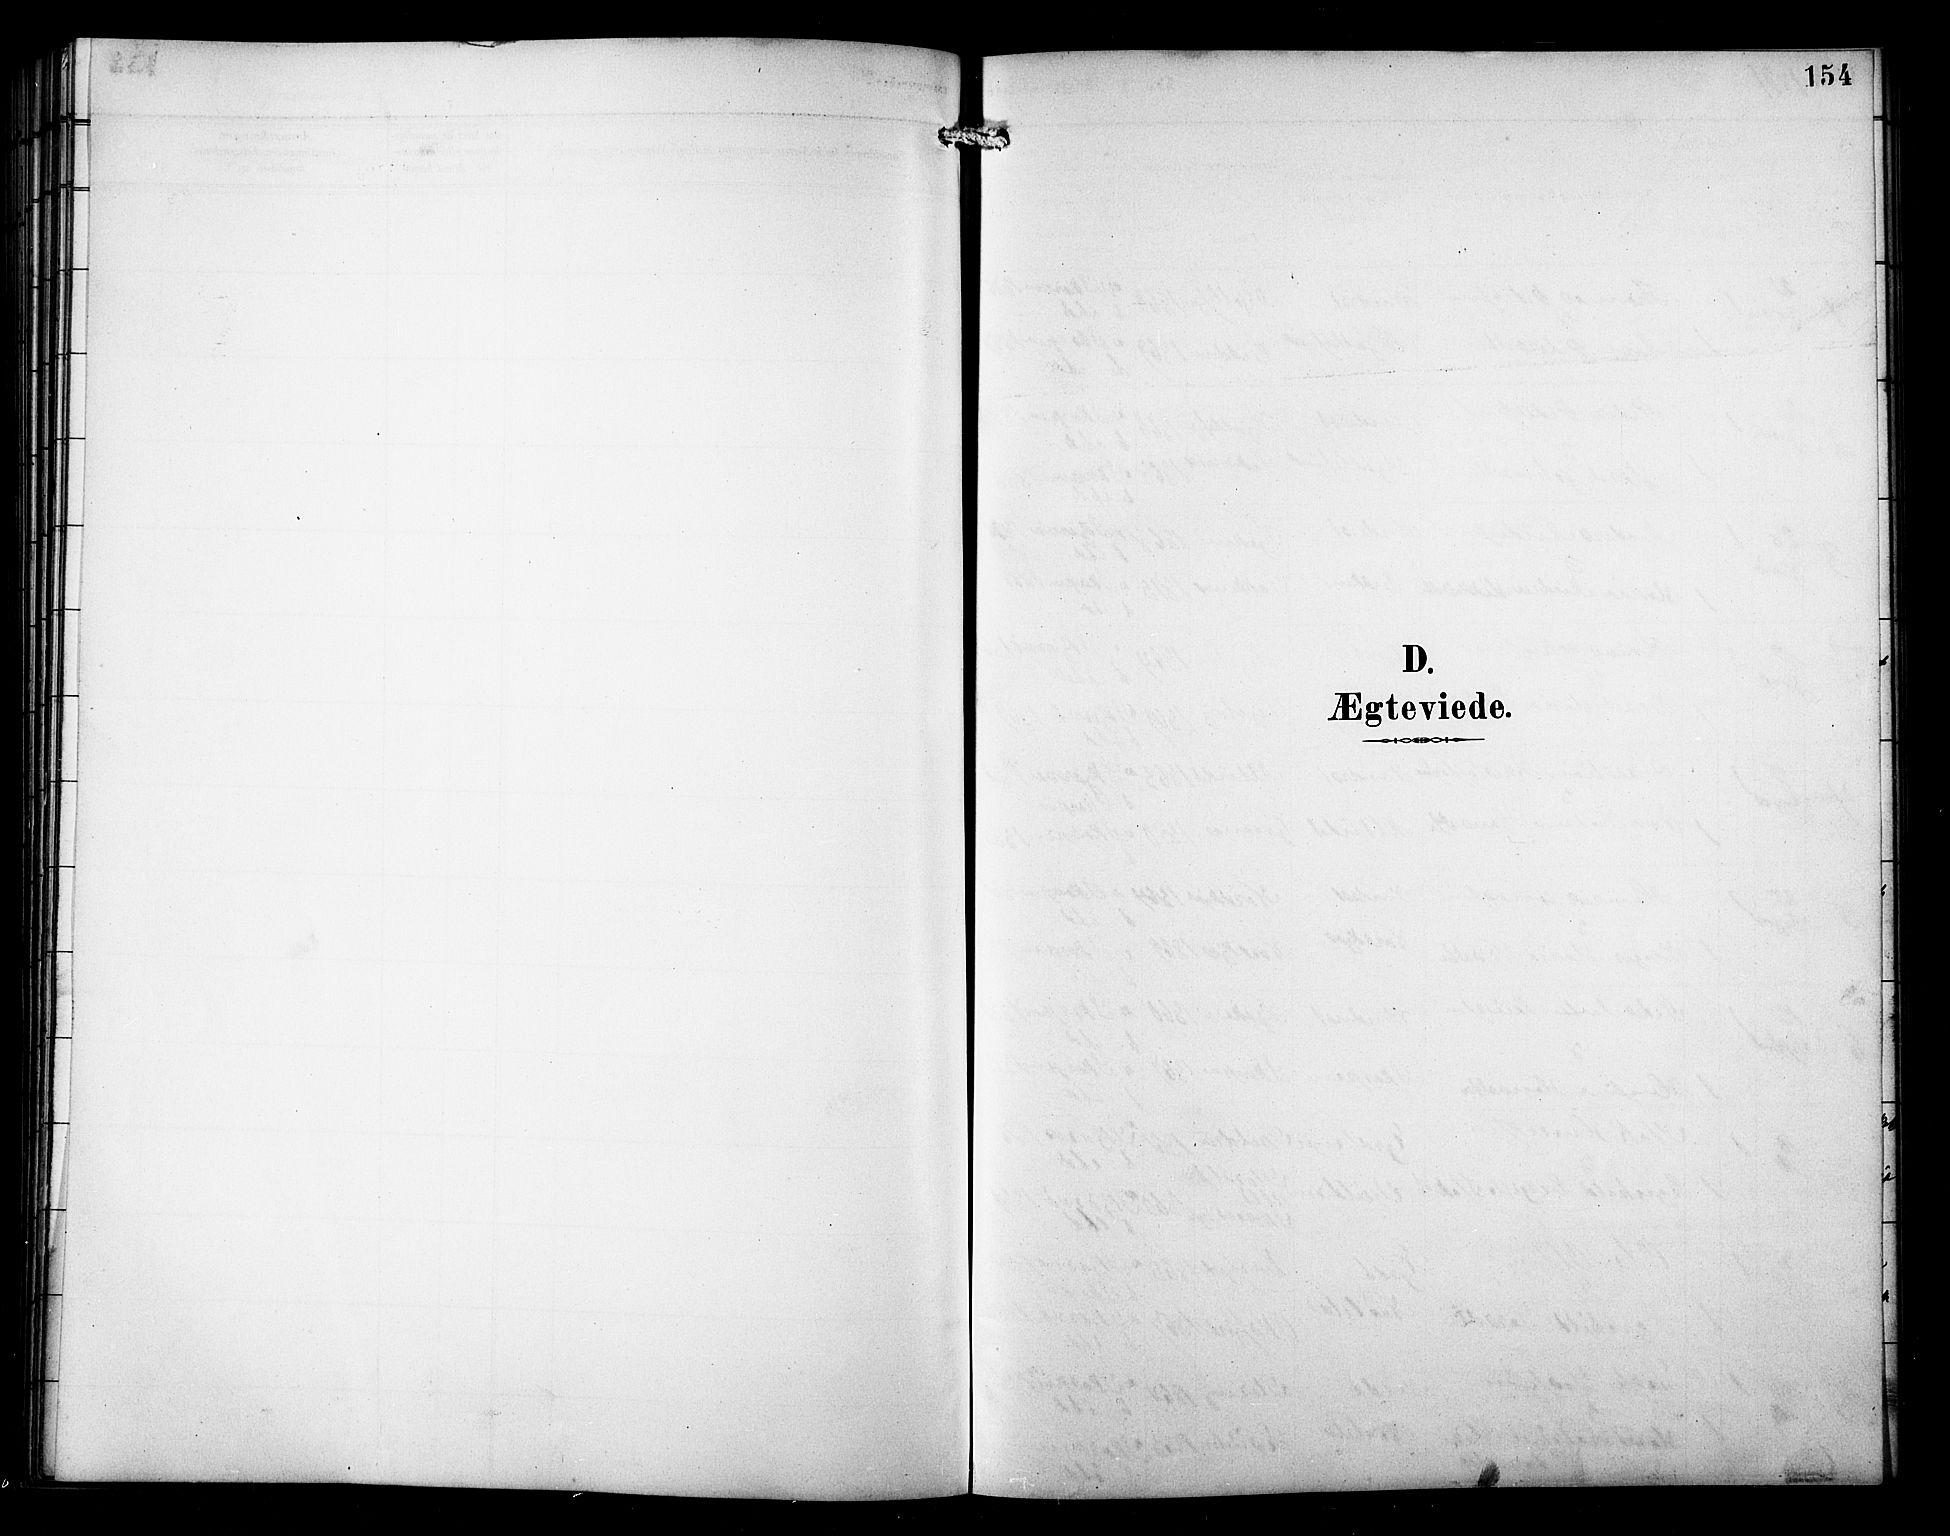 SATØ, Skjervøy sokneprestkontor, H/Ha/Hab/L0016klokker: Klokkerbok nr. 16, 1891-1907, s. 154